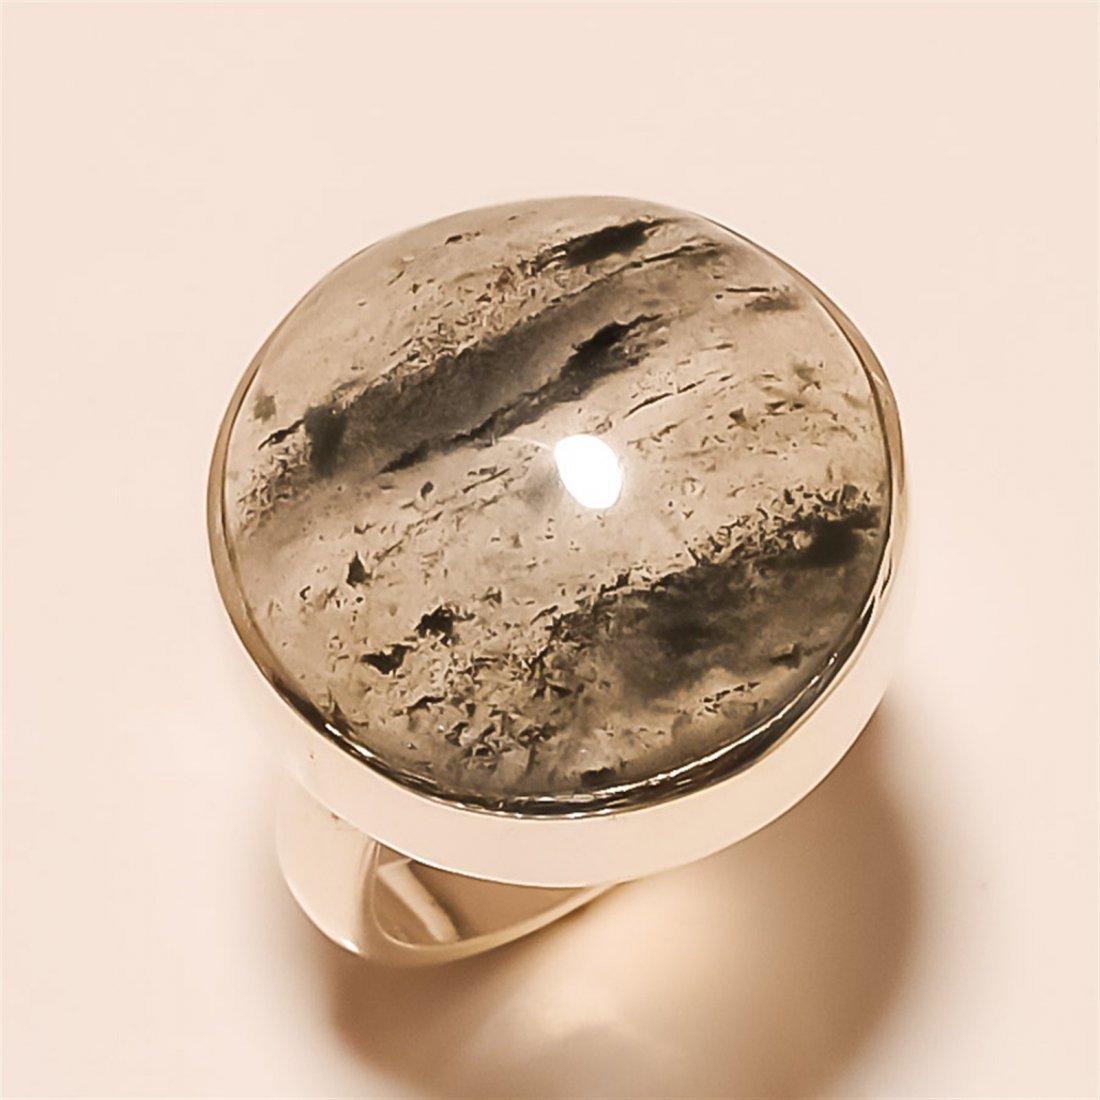 Black quartz RING Solid Sterling Silver